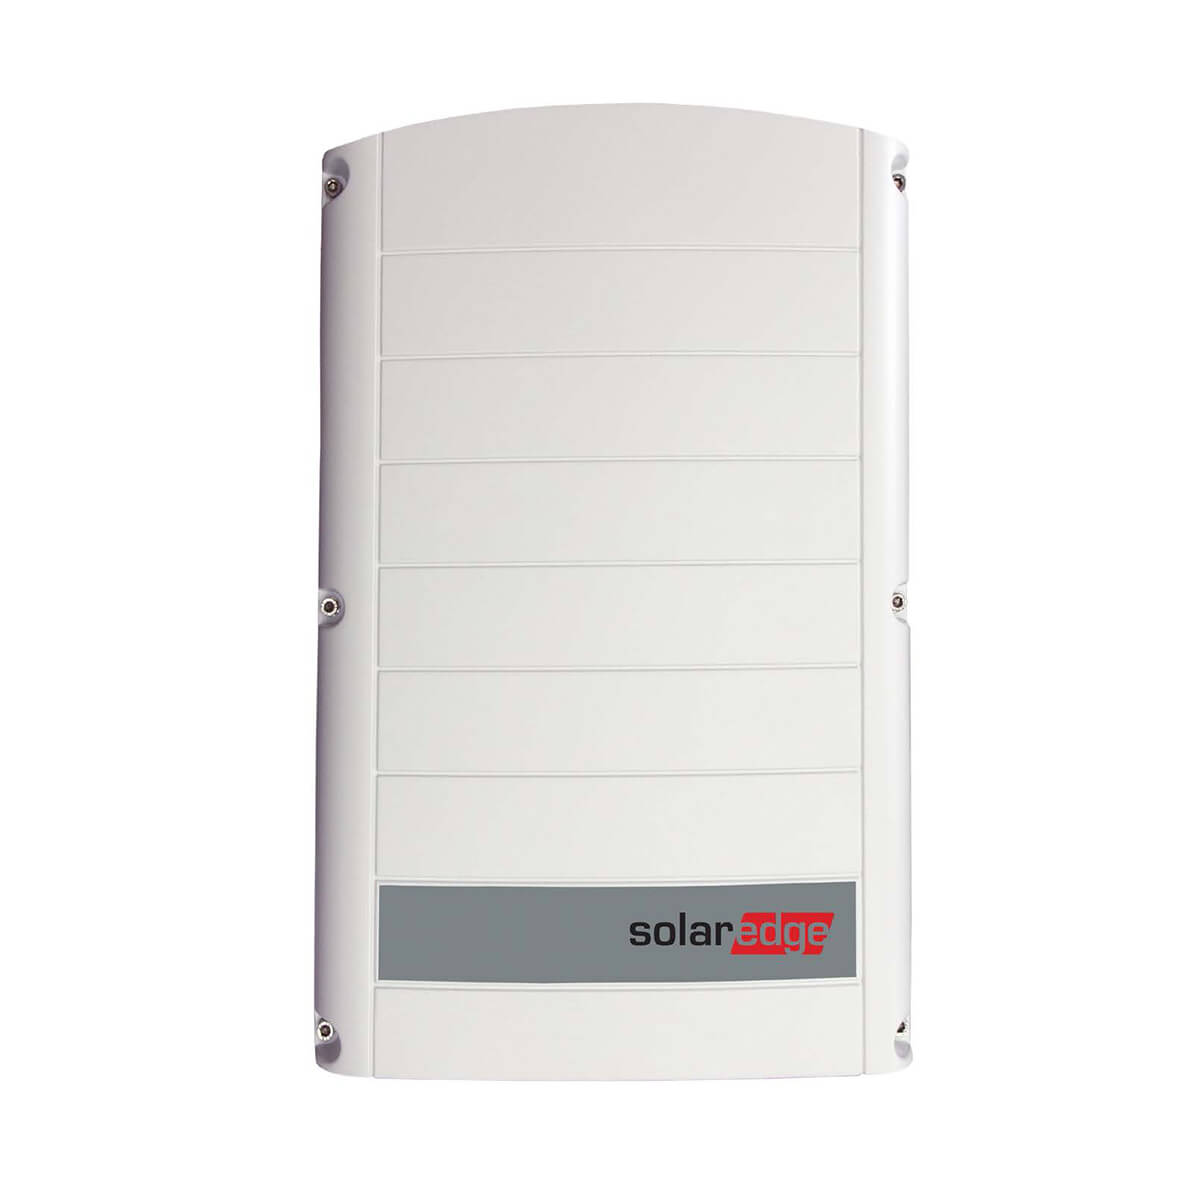 solaredge 16kW inverter, solaredge se16k 16kW inverter, solaredge se16k inverter, solaredge se16k, solaredge 16 kW